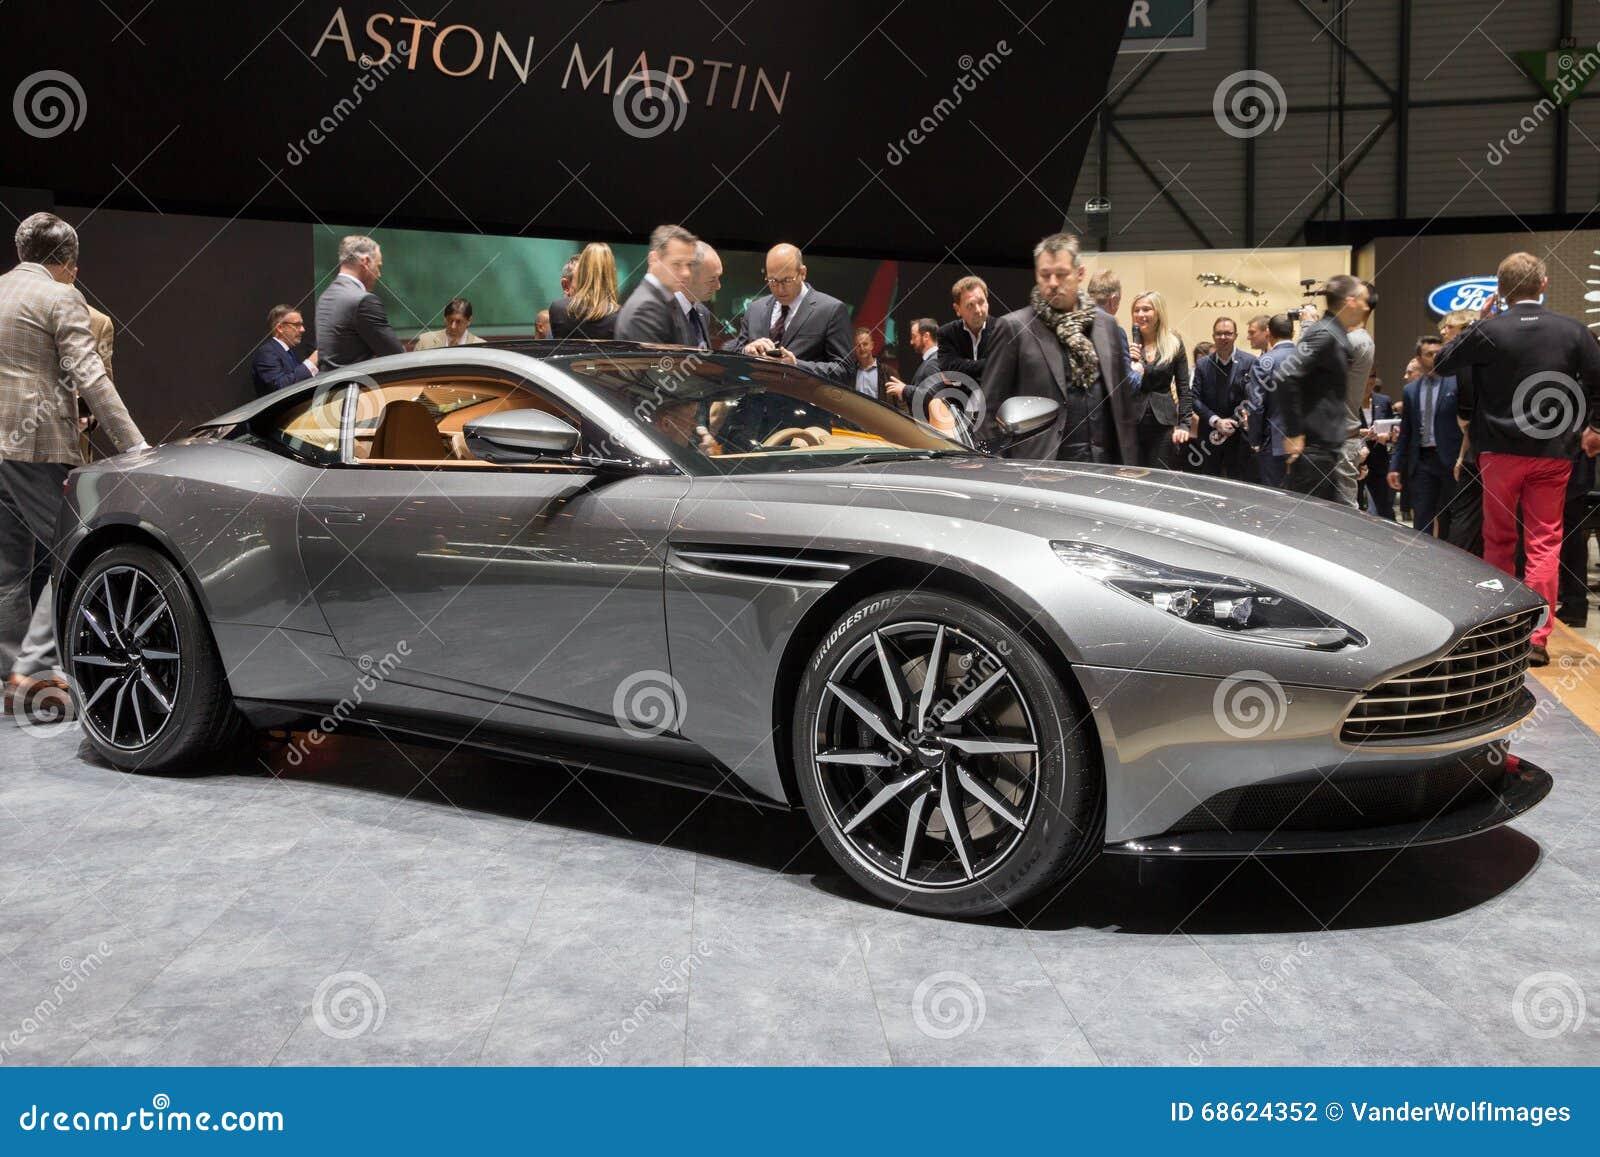 aston martin db11 sports car editorial photography image 68624352. Black Bedroom Furniture Sets. Home Design Ideas